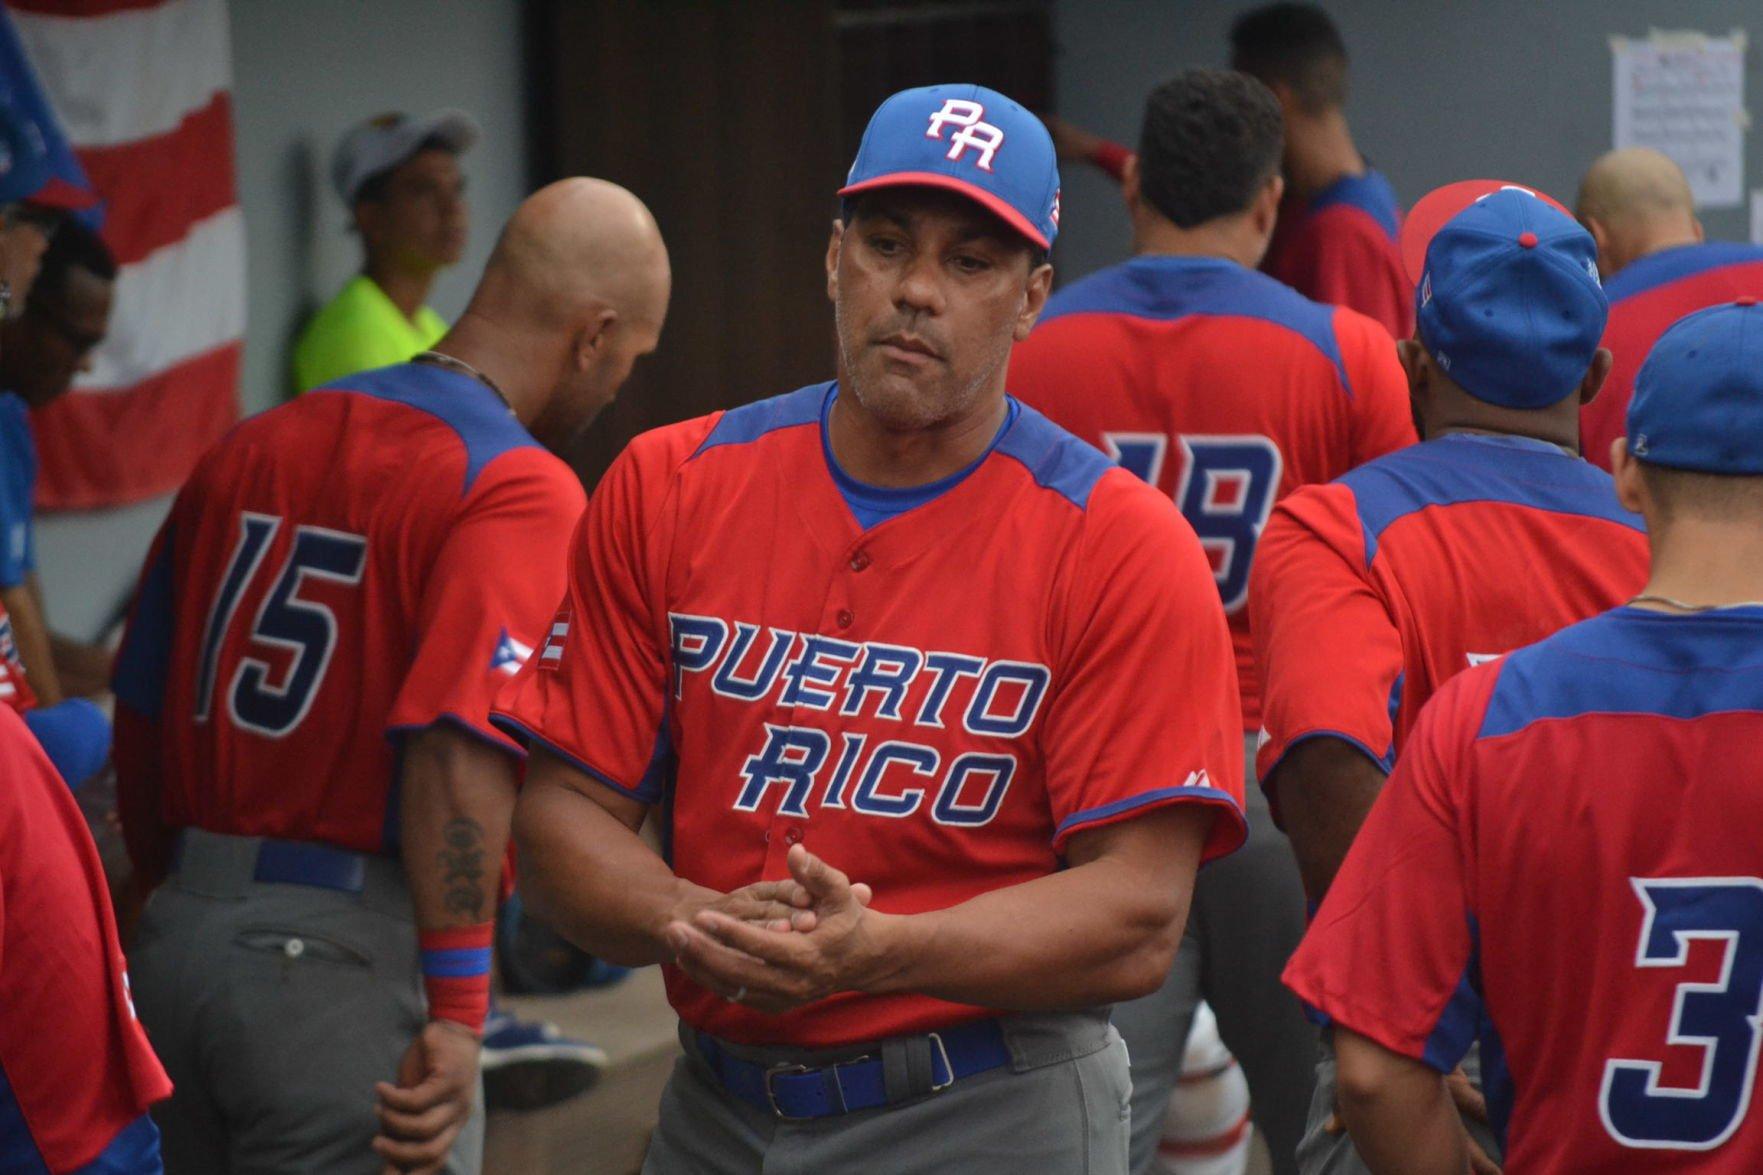 Selección nacional de béisbol partirá hacia República Dominicana